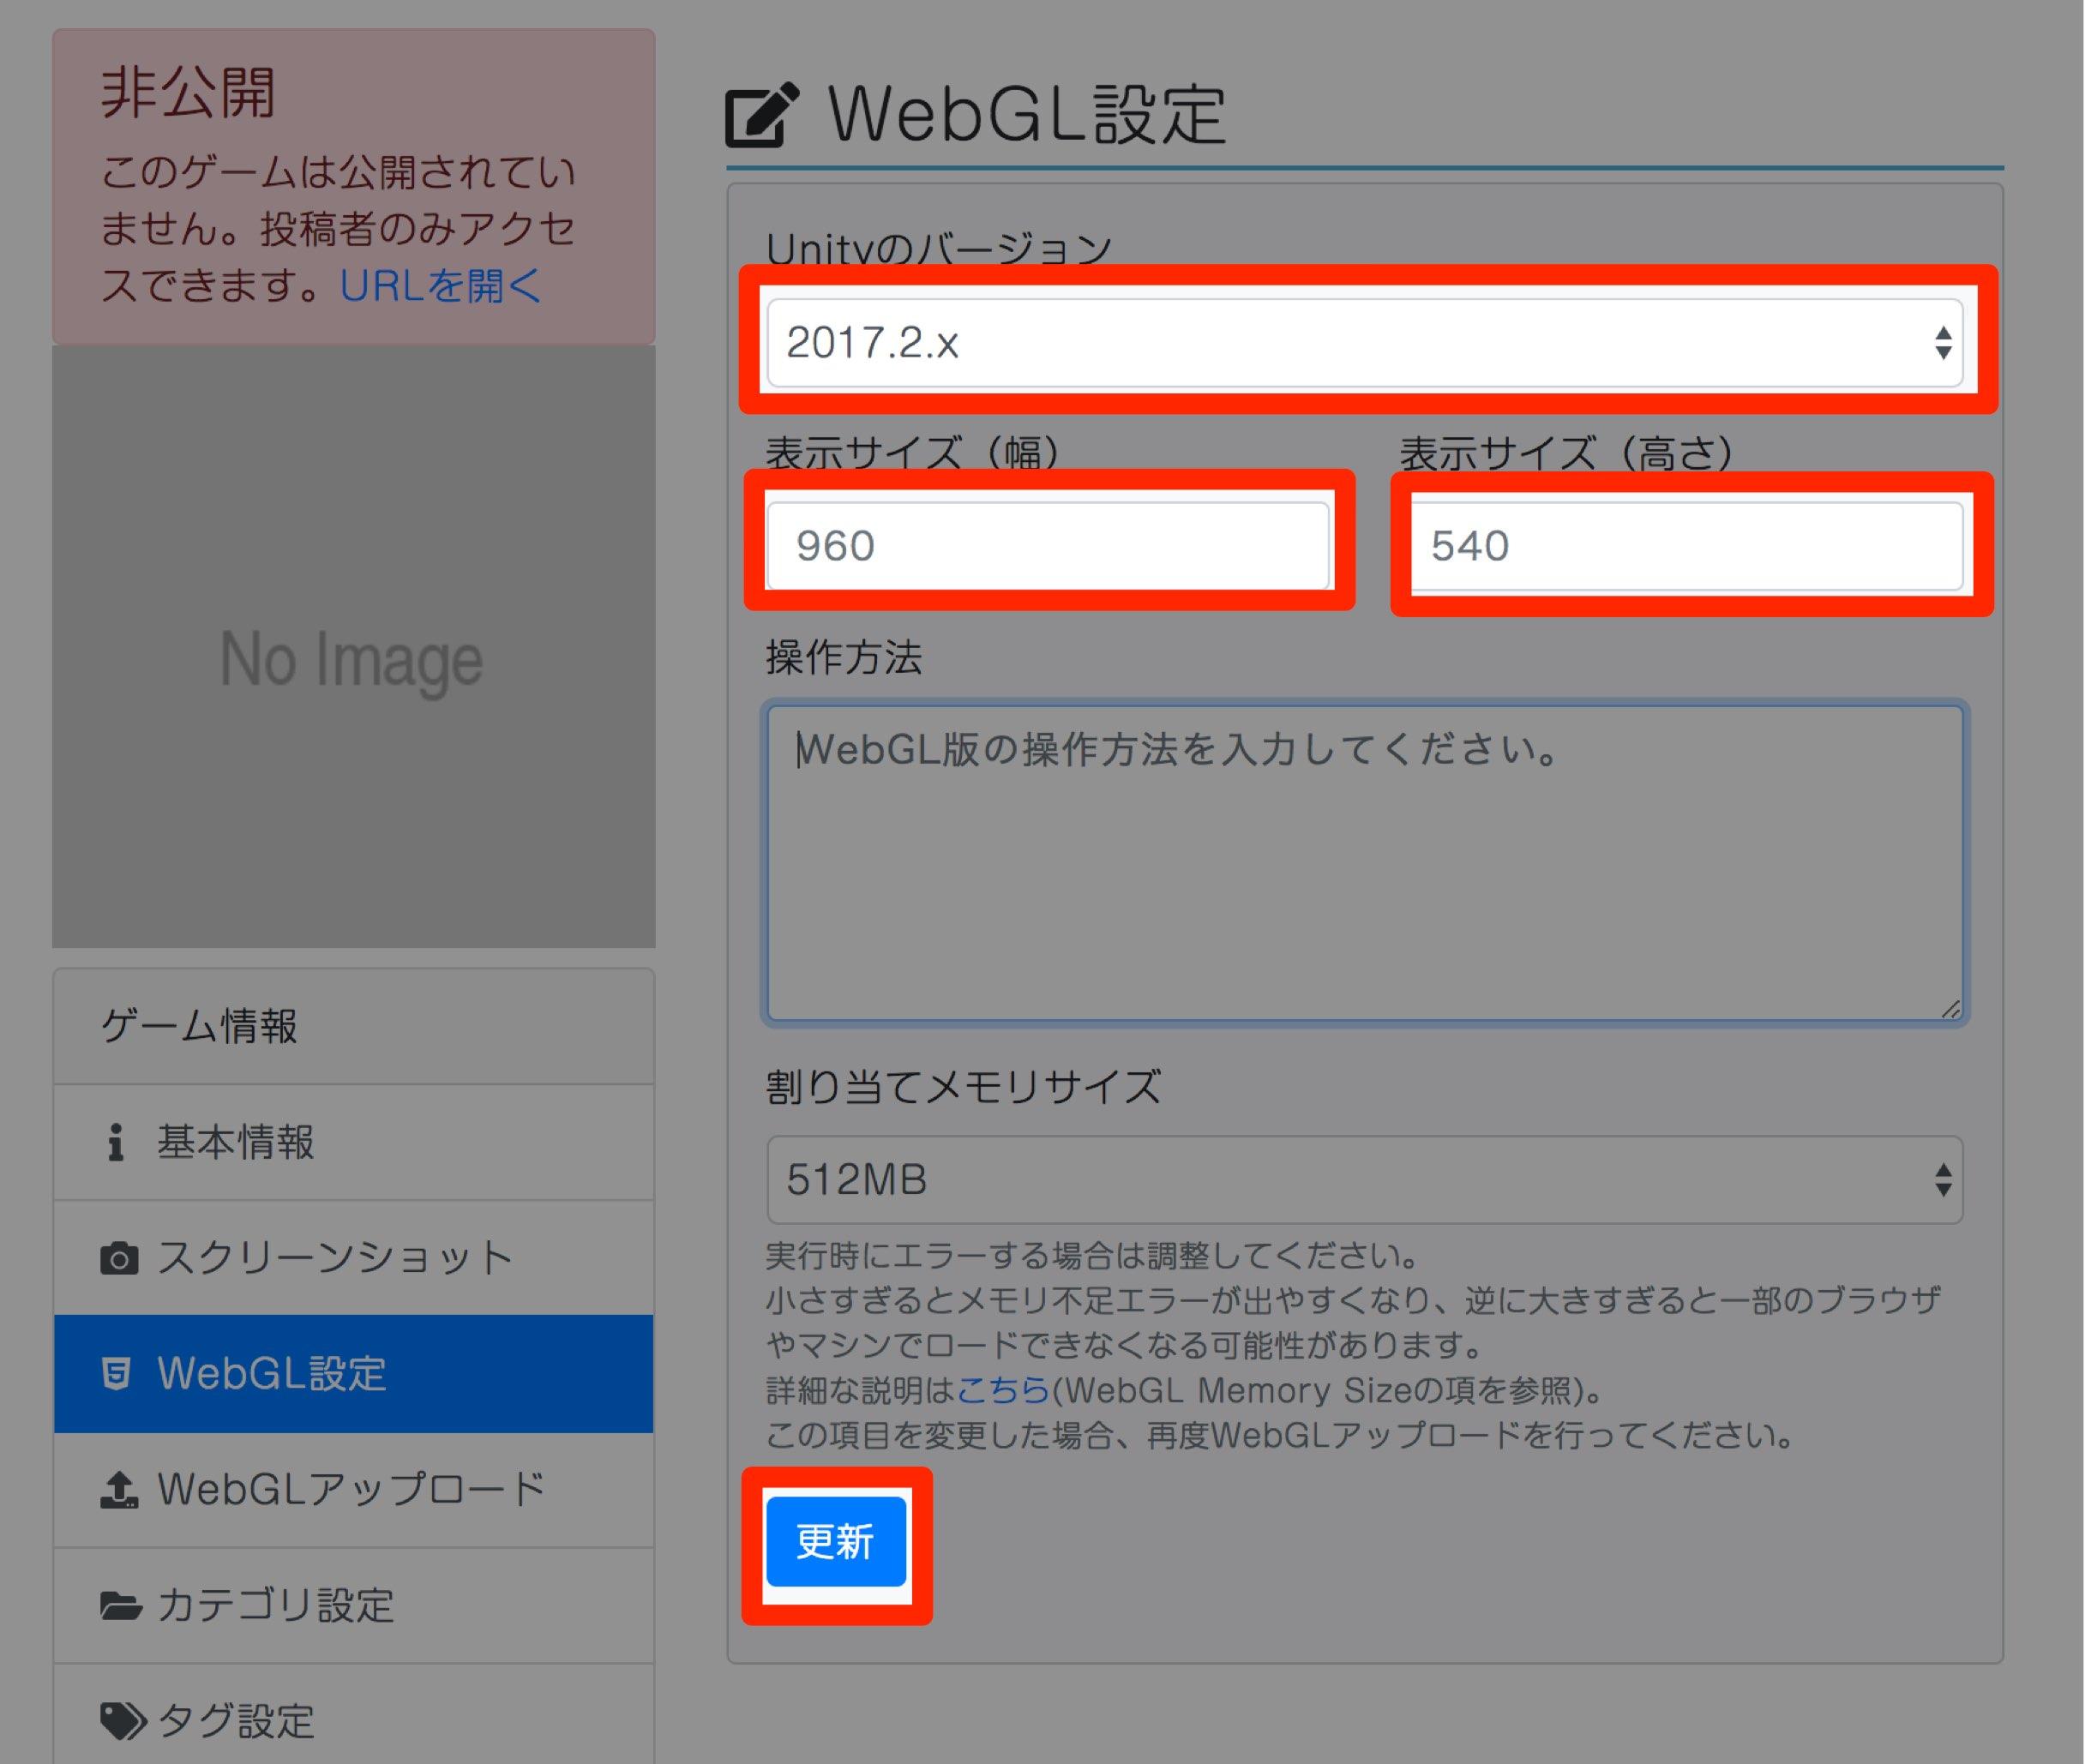 cubeのWebGL設定  無料ゲーム投稿サイト unityroom - Unityのゲームをアップロードして公開しよう.jpg